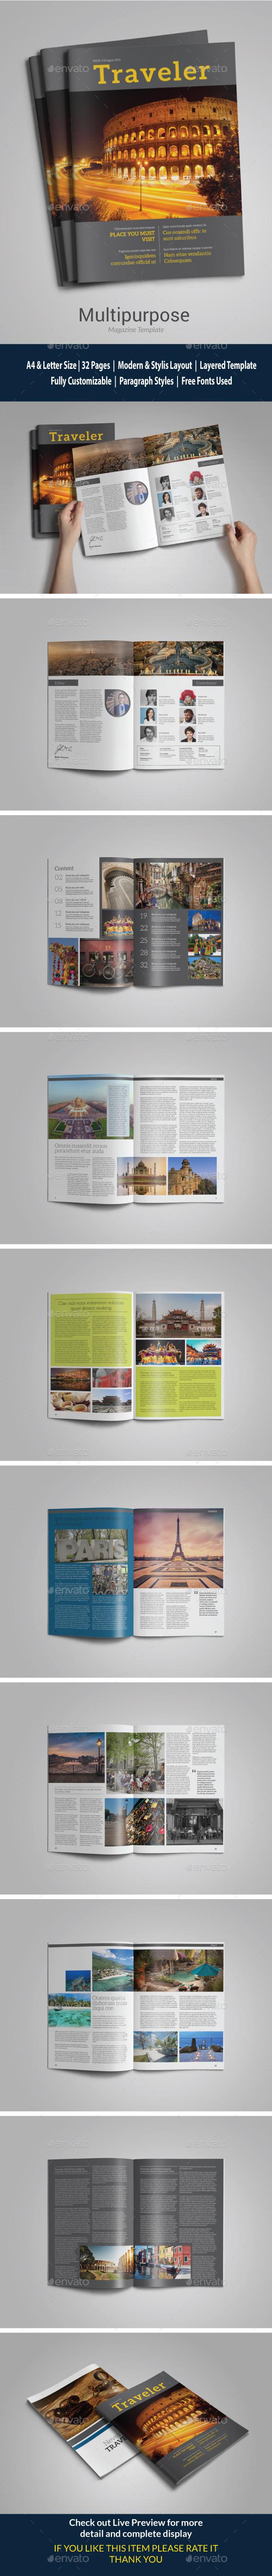 Indesign Travel Magazine vol 1  - Magazines Print Templates